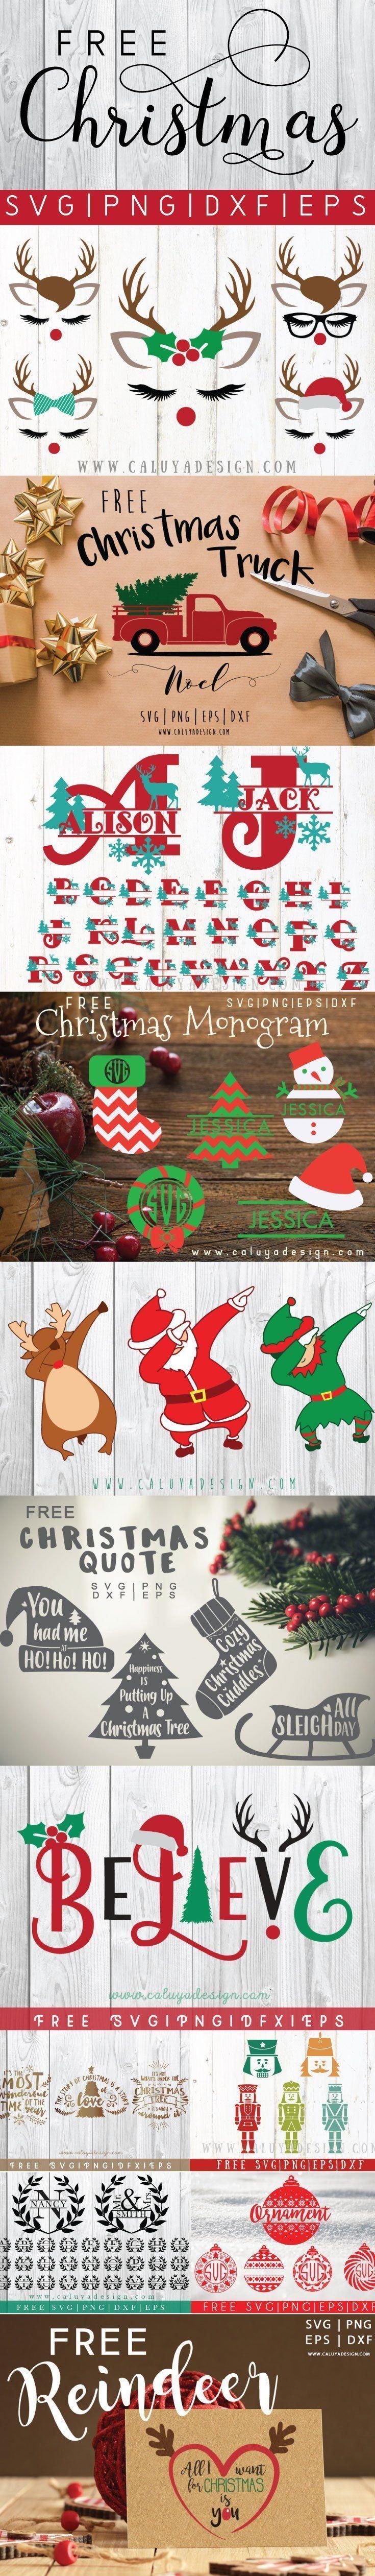 Free 12 Christmas Svg Png Dxf Eps Bundle Christmas Svg Christmas Svg Files Cricut Crafts